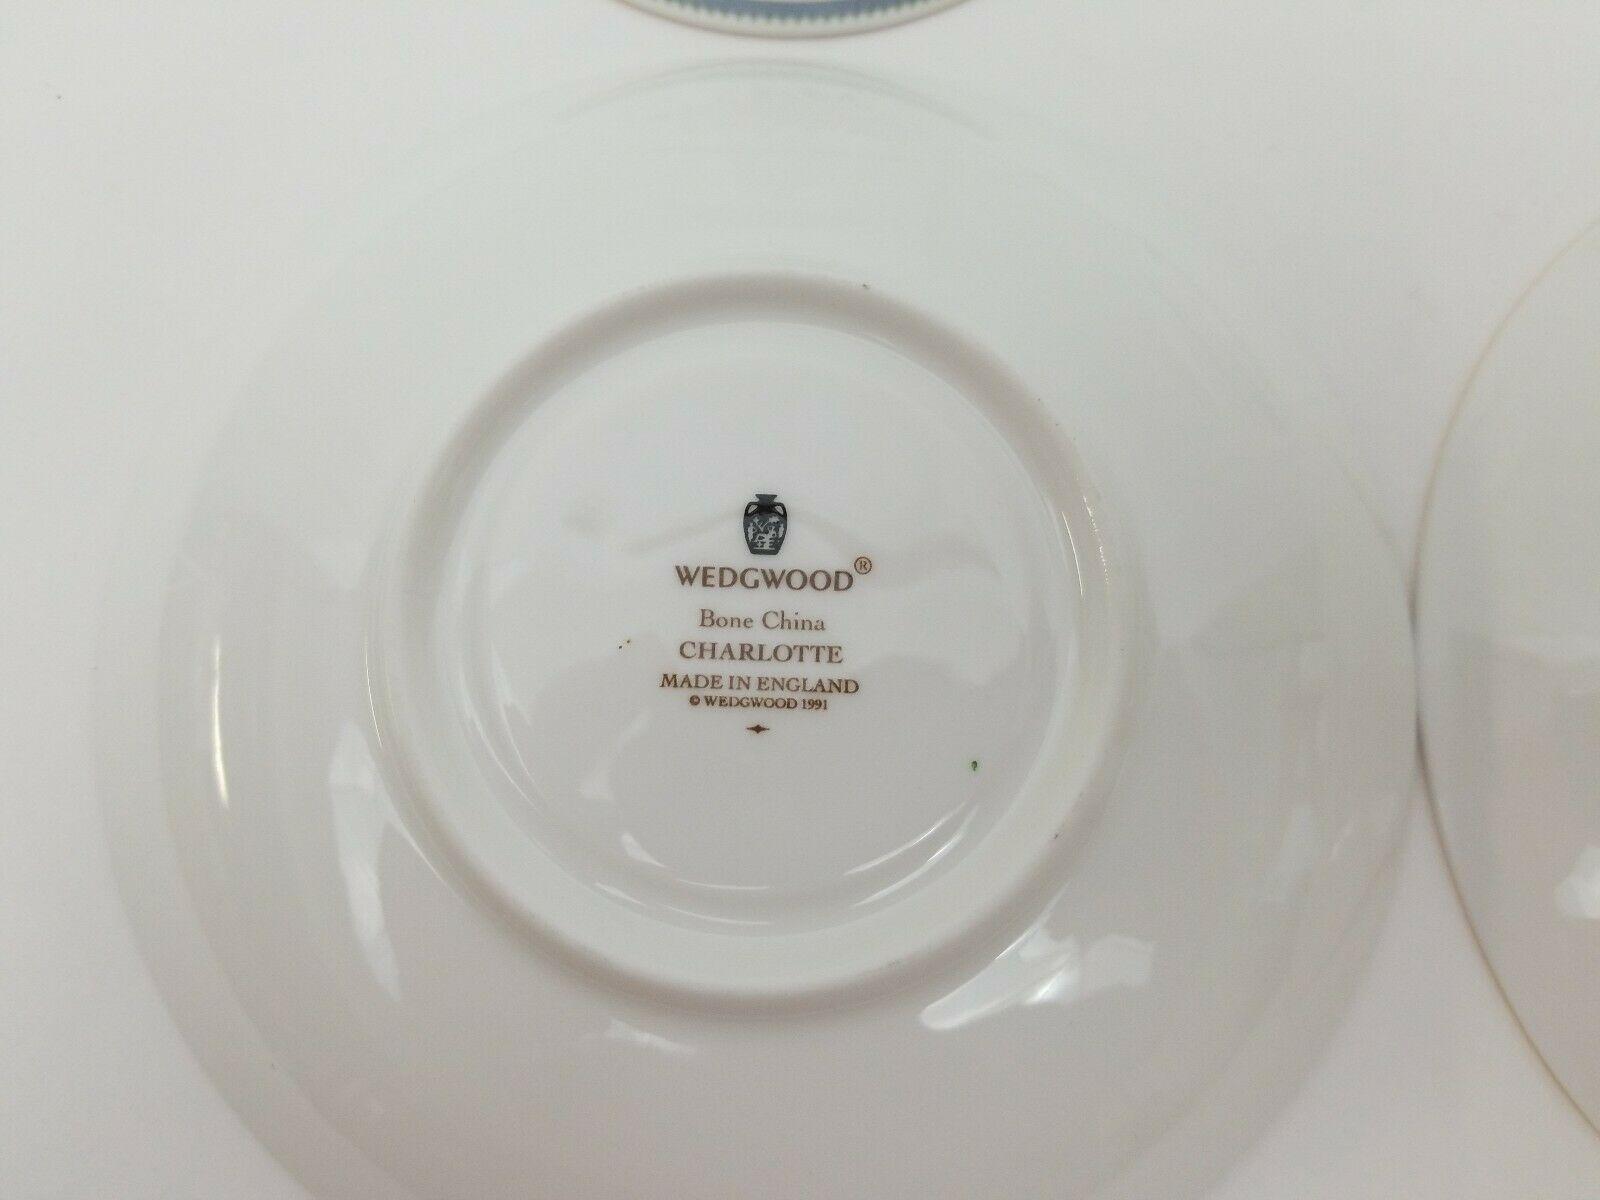 Wedgwood Bone China Cup & Saucer Set of 2 Charlotte White Gold Trim England 1991 image 6